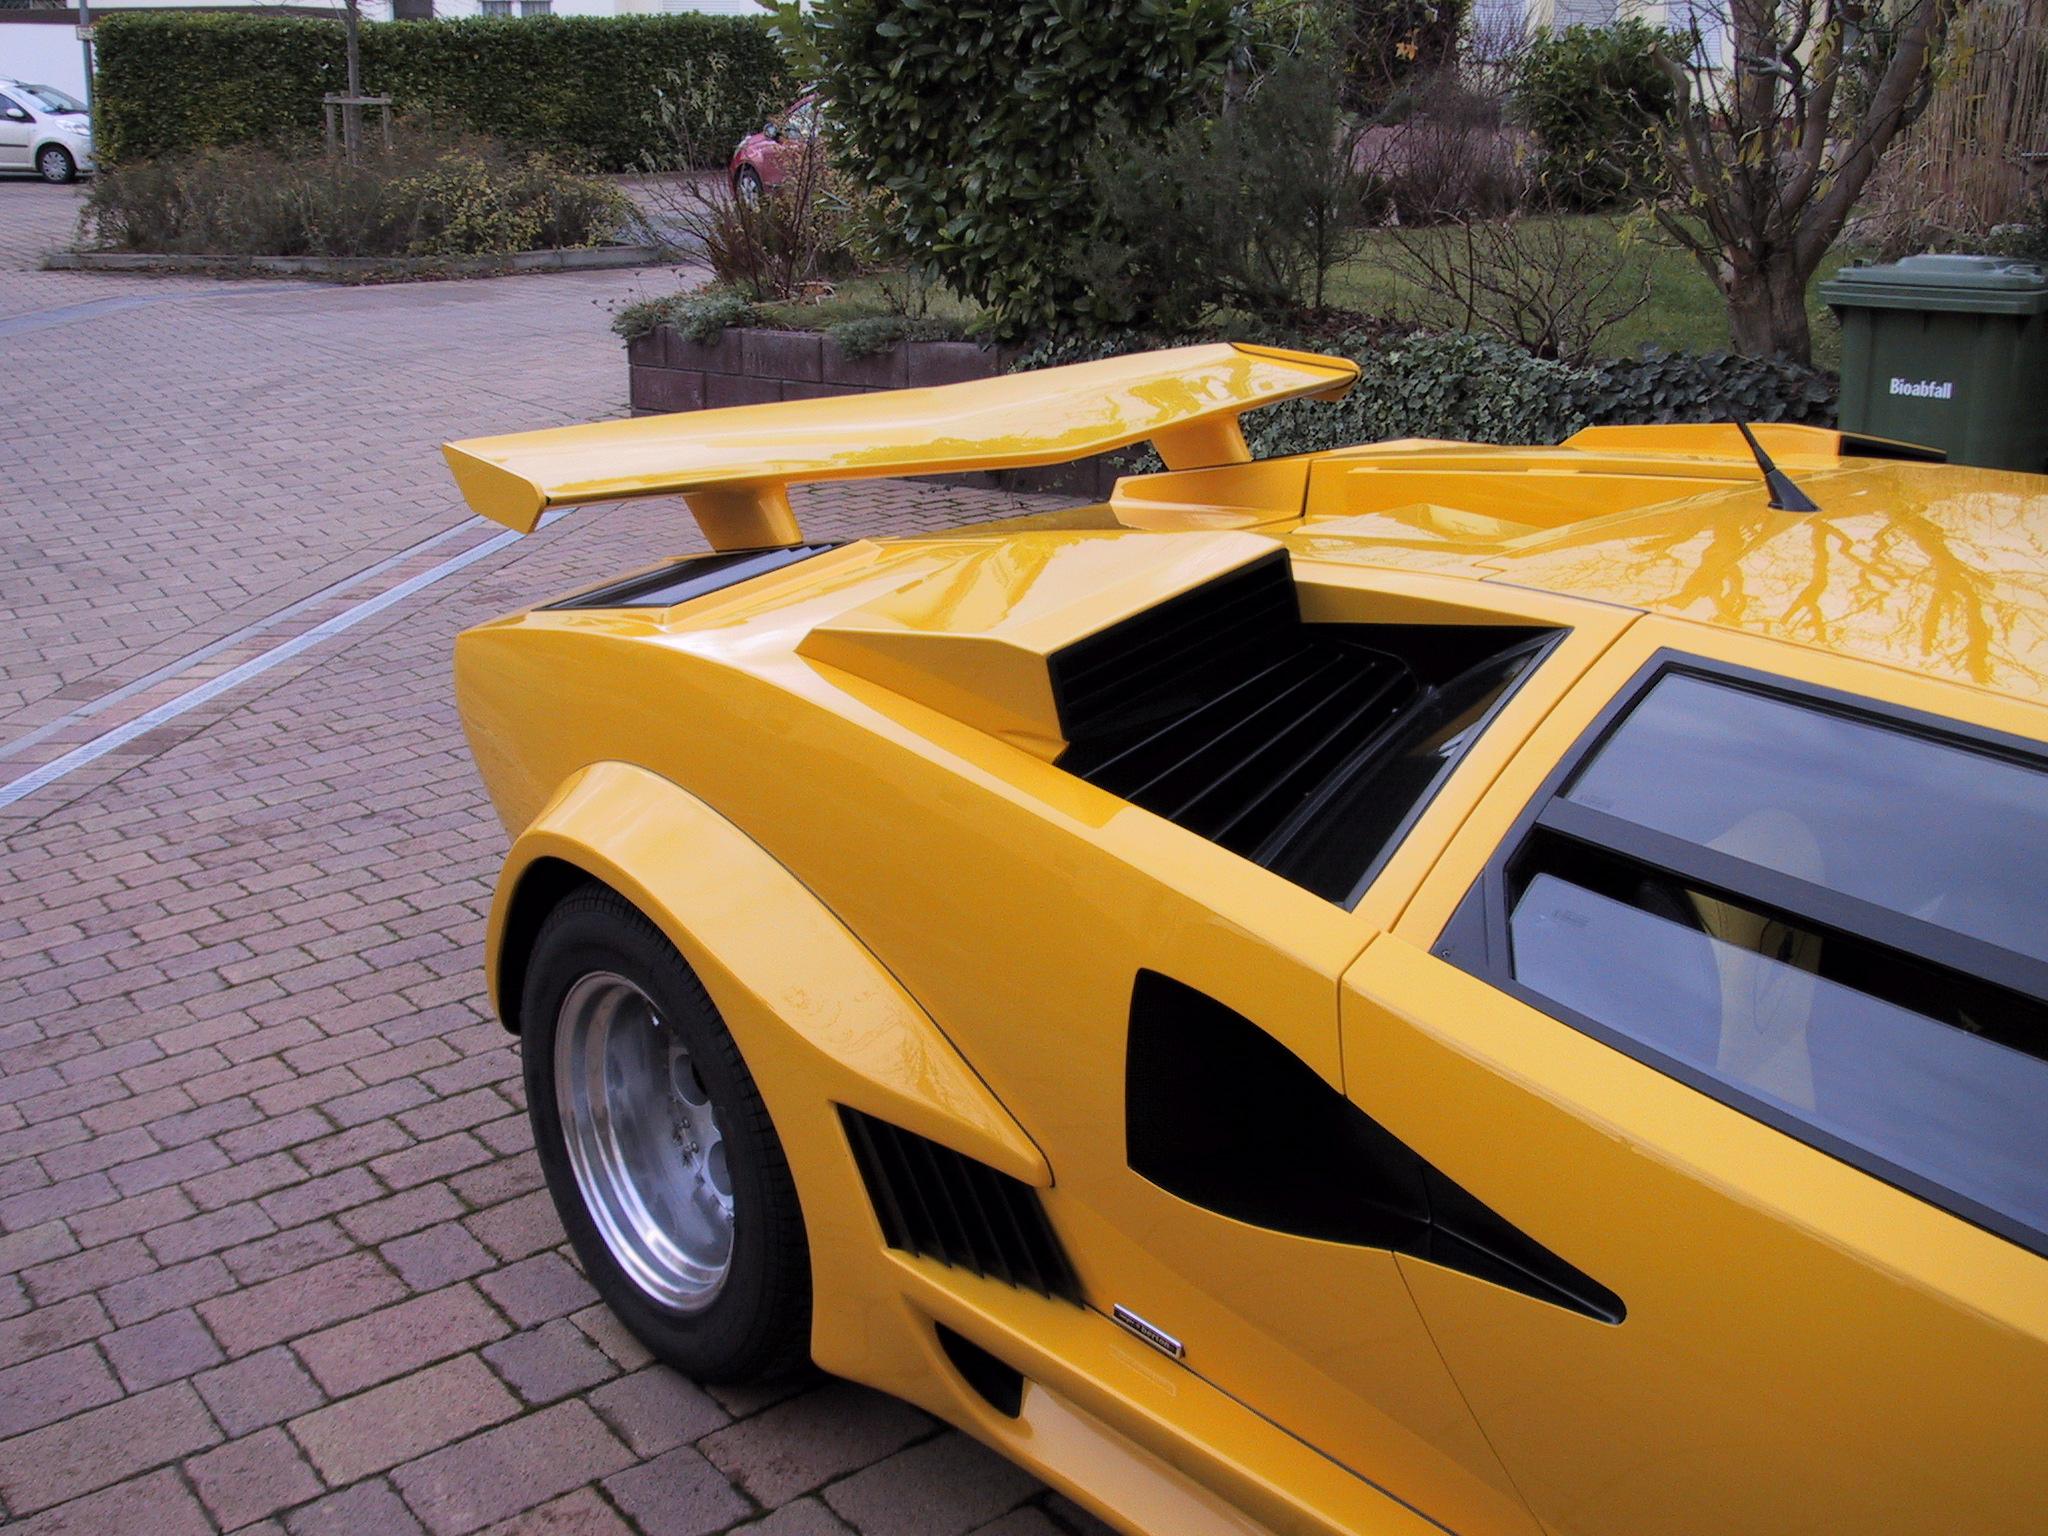 Lambobilder%20005 Wonderful Lamborghini Countach Strohm De Rella Cars Trend